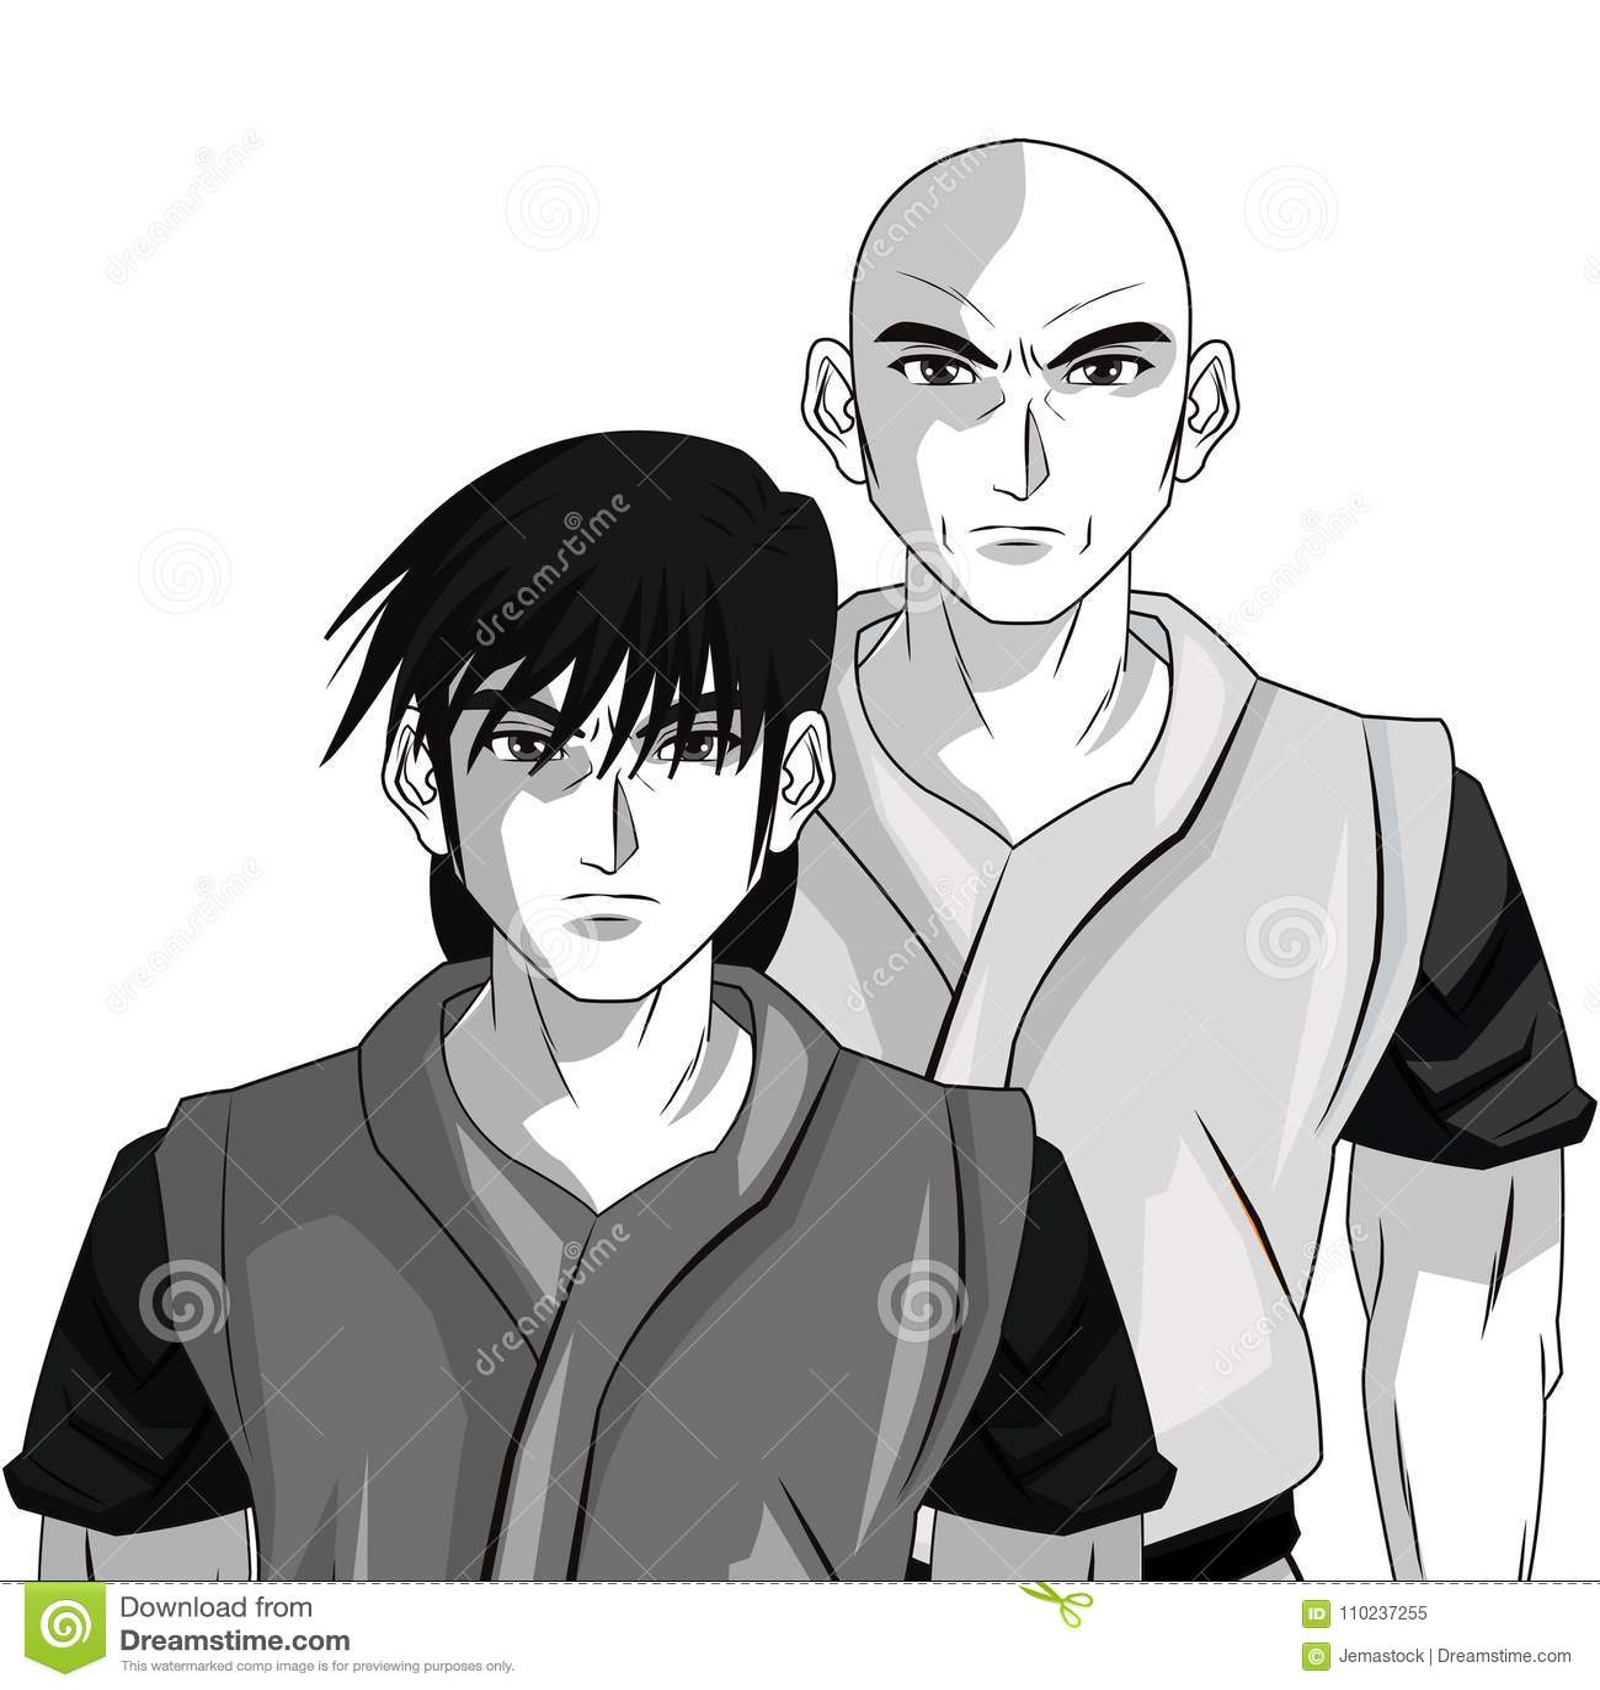 Man boy anime comic design stock vector illustration of